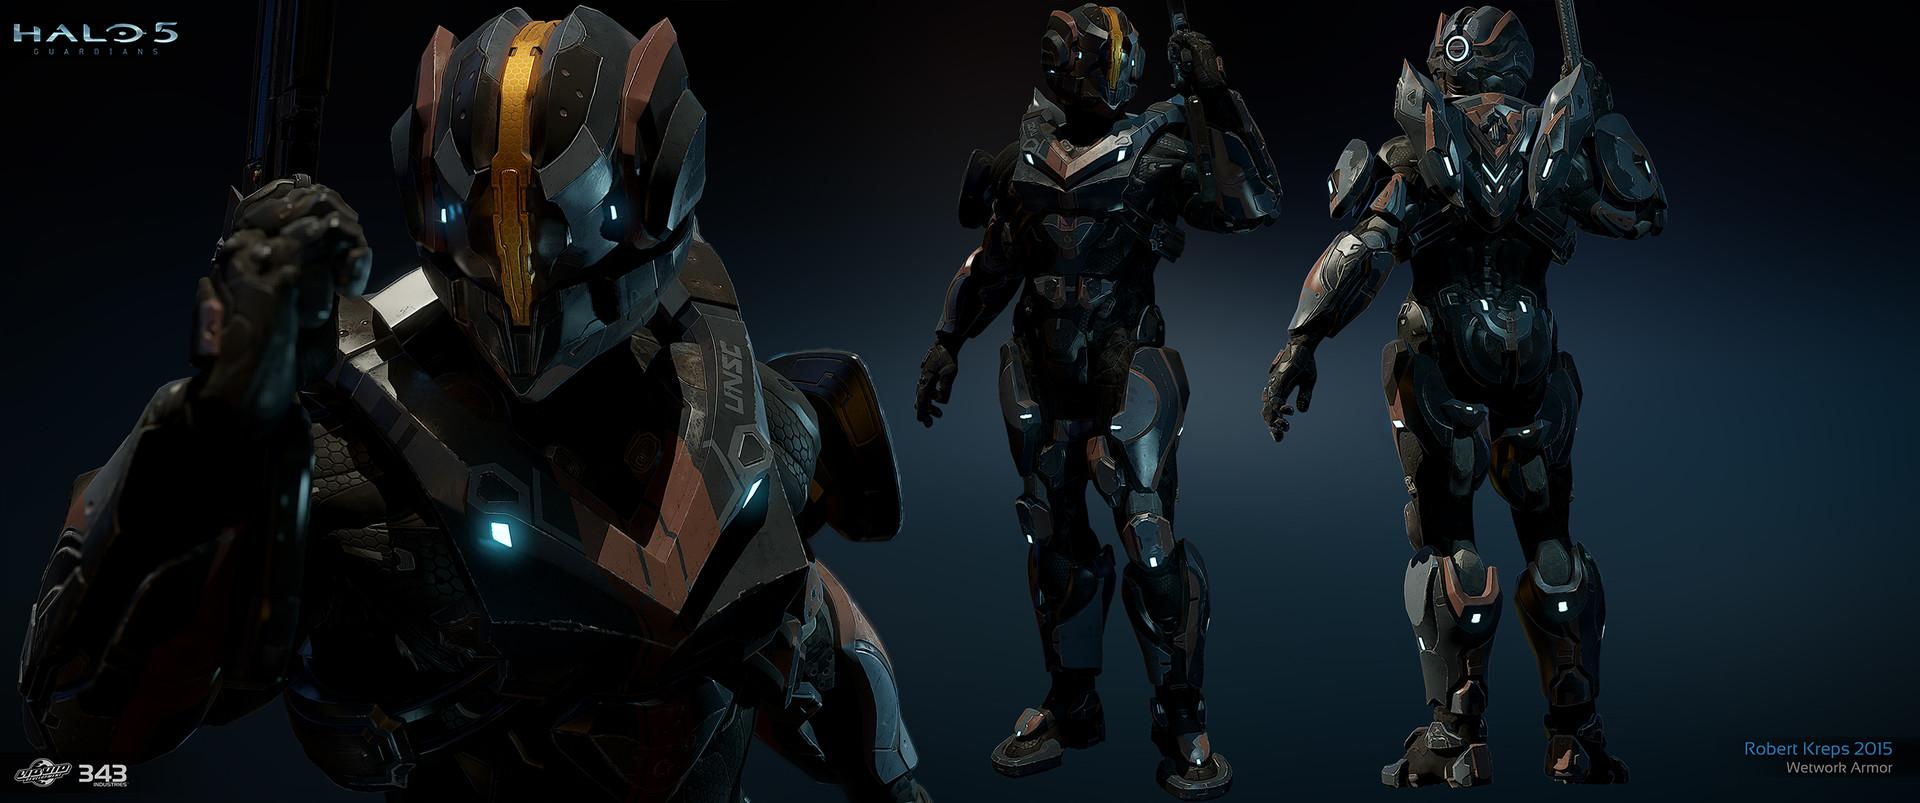 Robert Kreps - Halo 5 Guardians - Armor Permutations